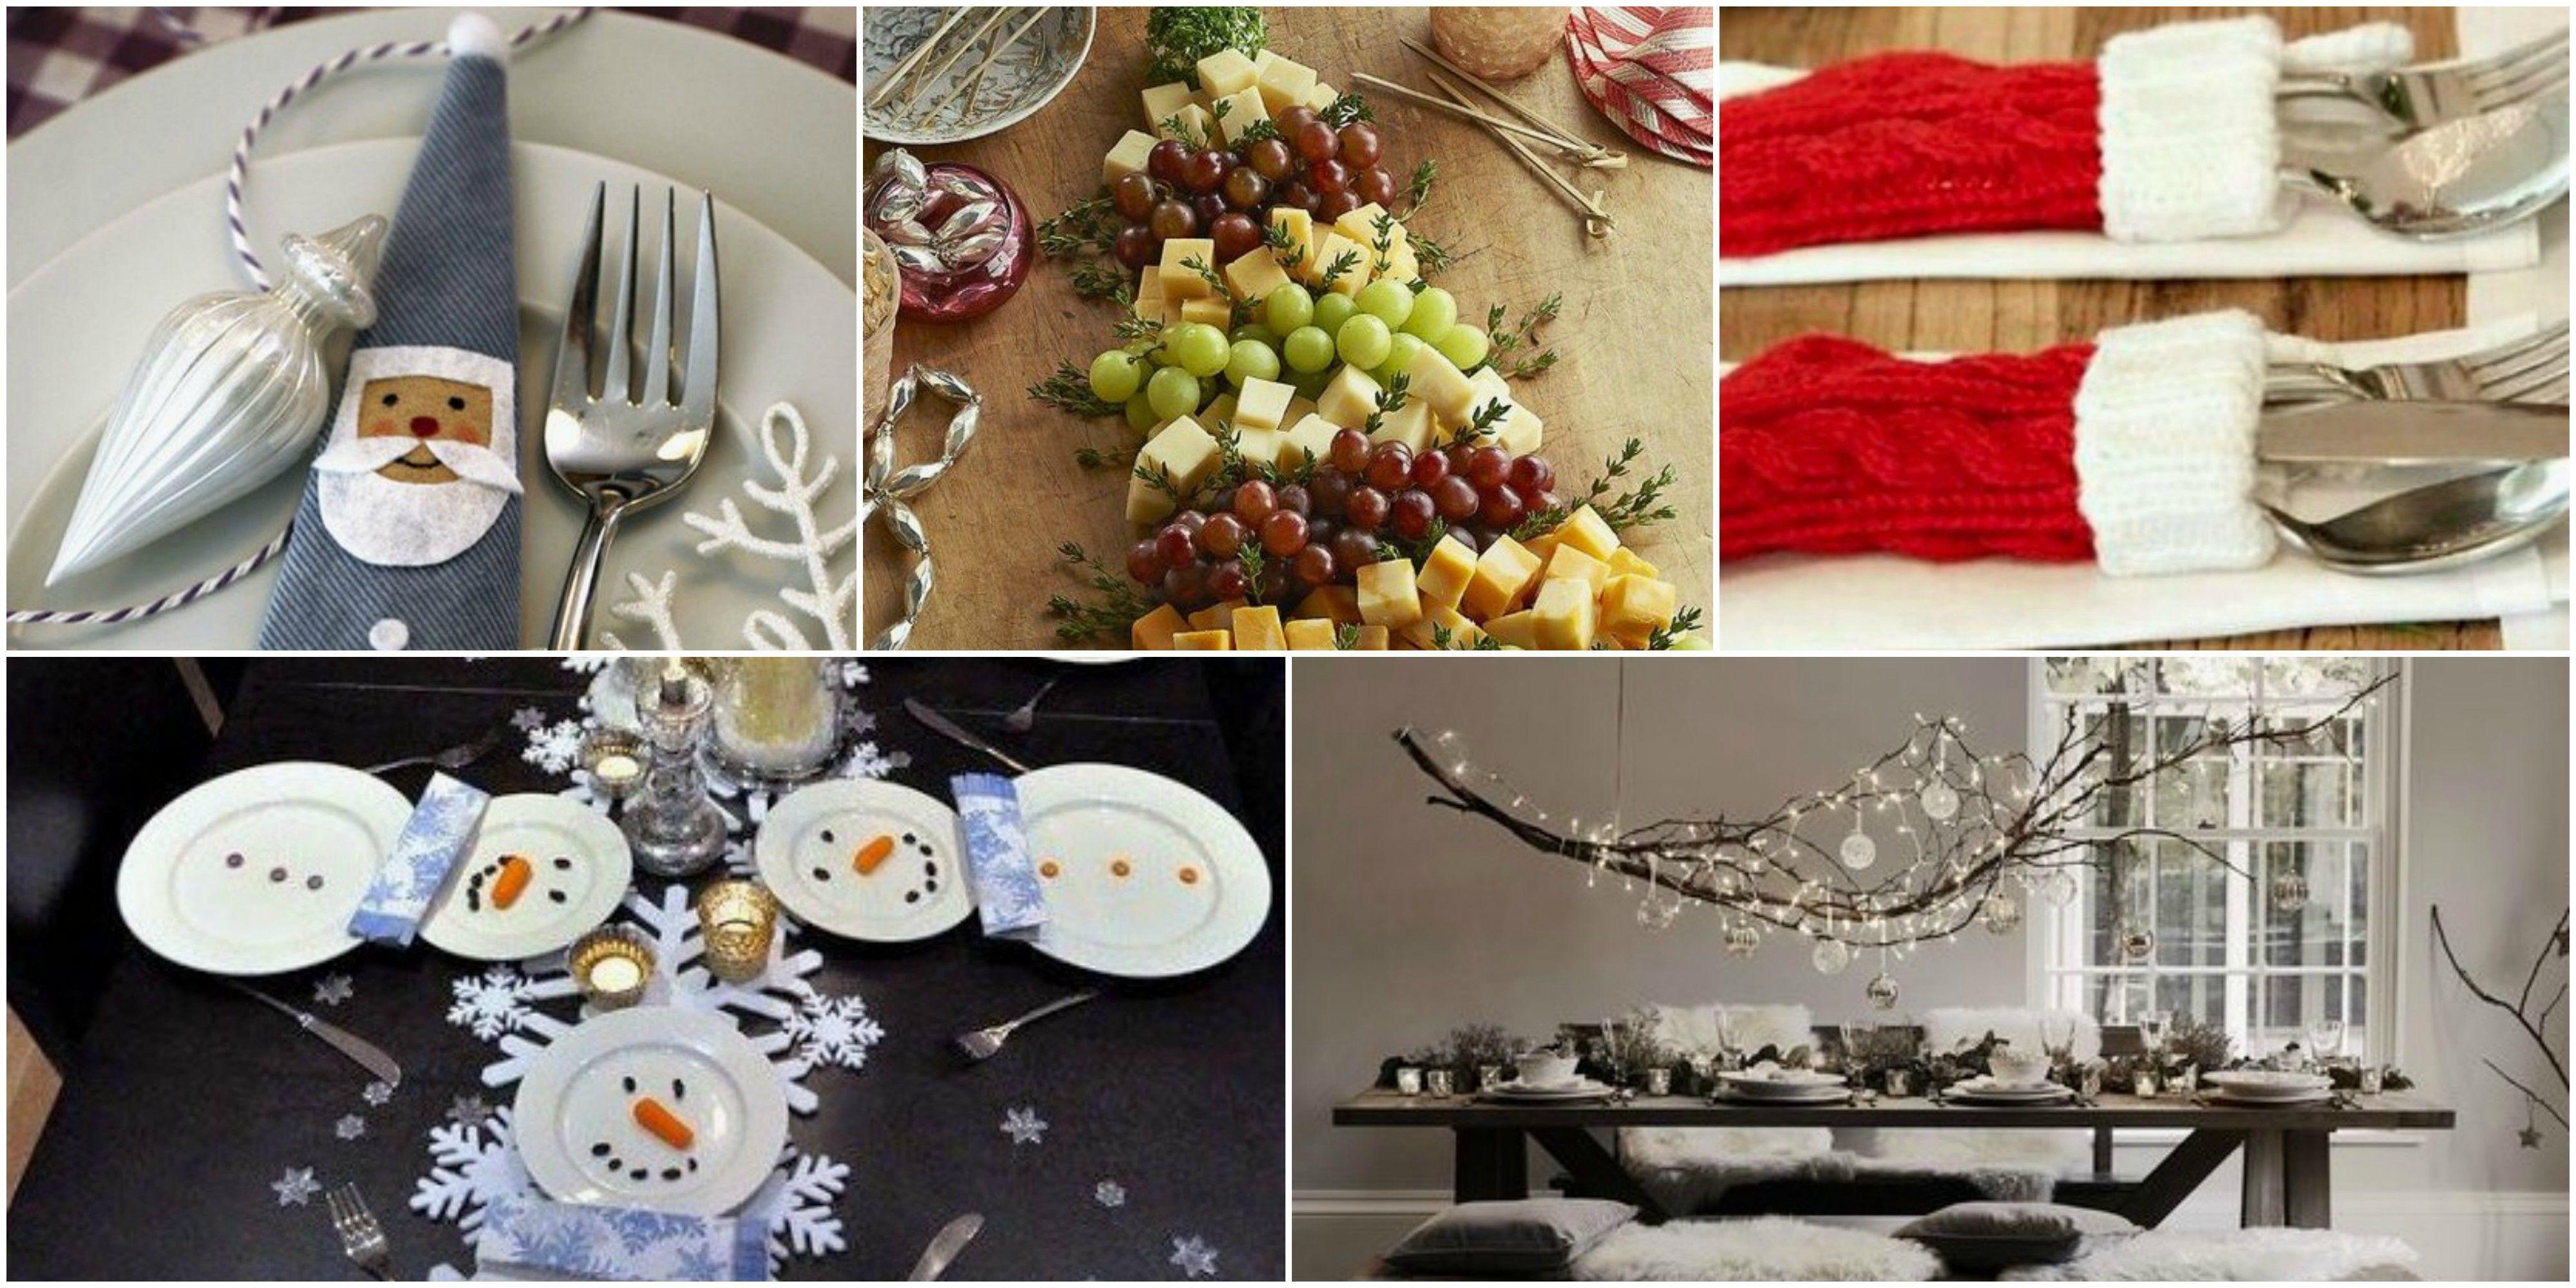 Christmas table setting ideas - Pinterest & 15 Fun and Quirky Christmas Table Setting Ideas - Christmas Table ...